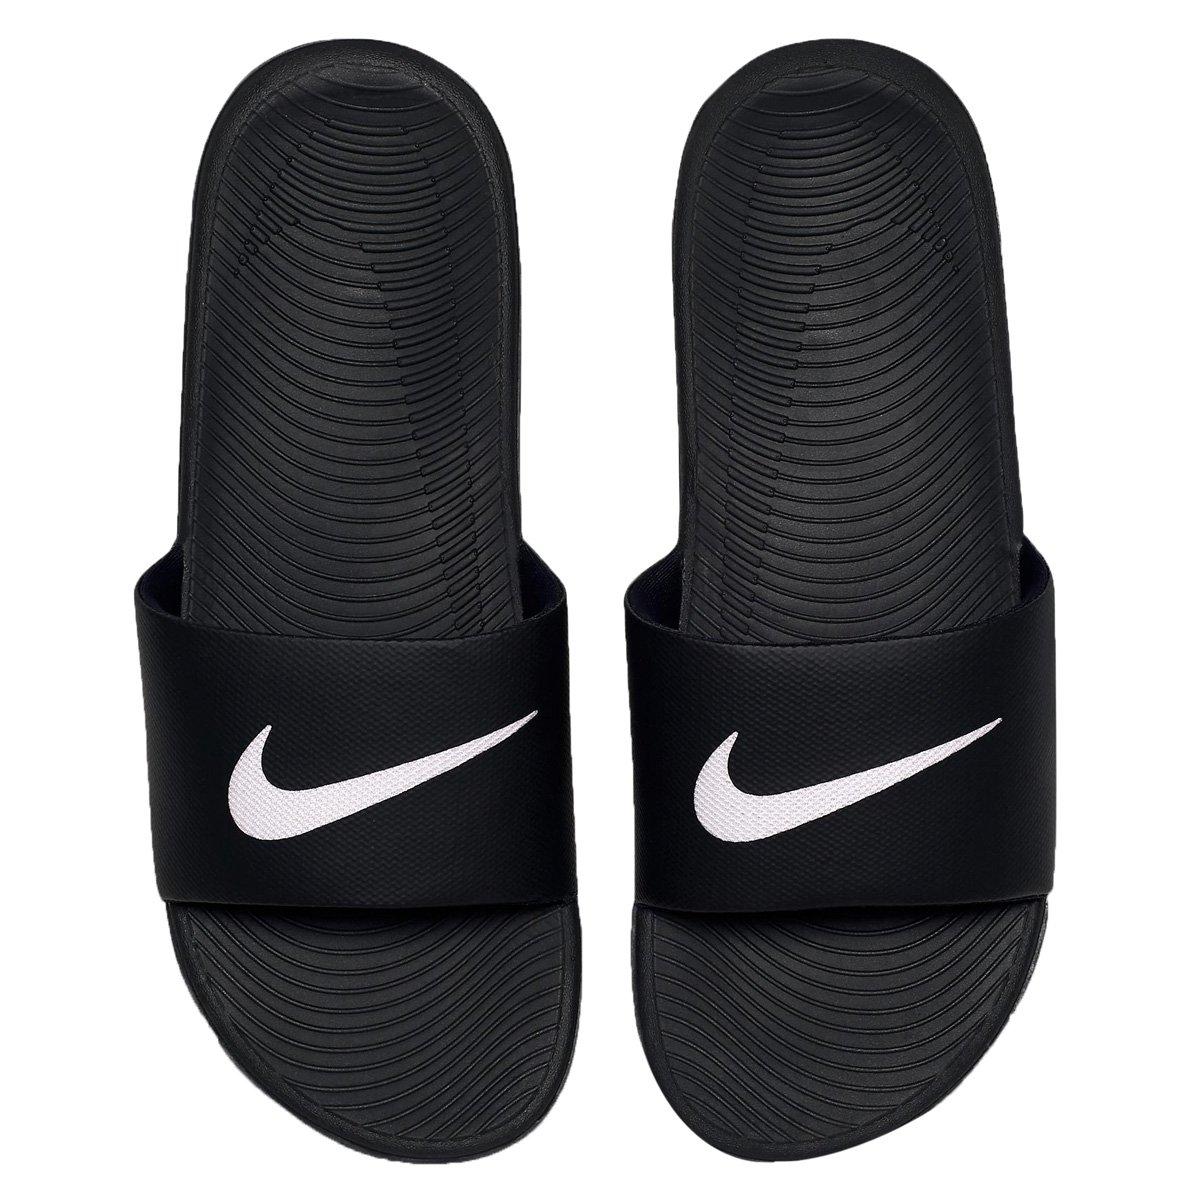 515908ce10 Amplie a imagem. Sandália Masculina Nike kawa Slide; Sandália Masculina  Nike kawa Slide 2; Sandália Masculina ...